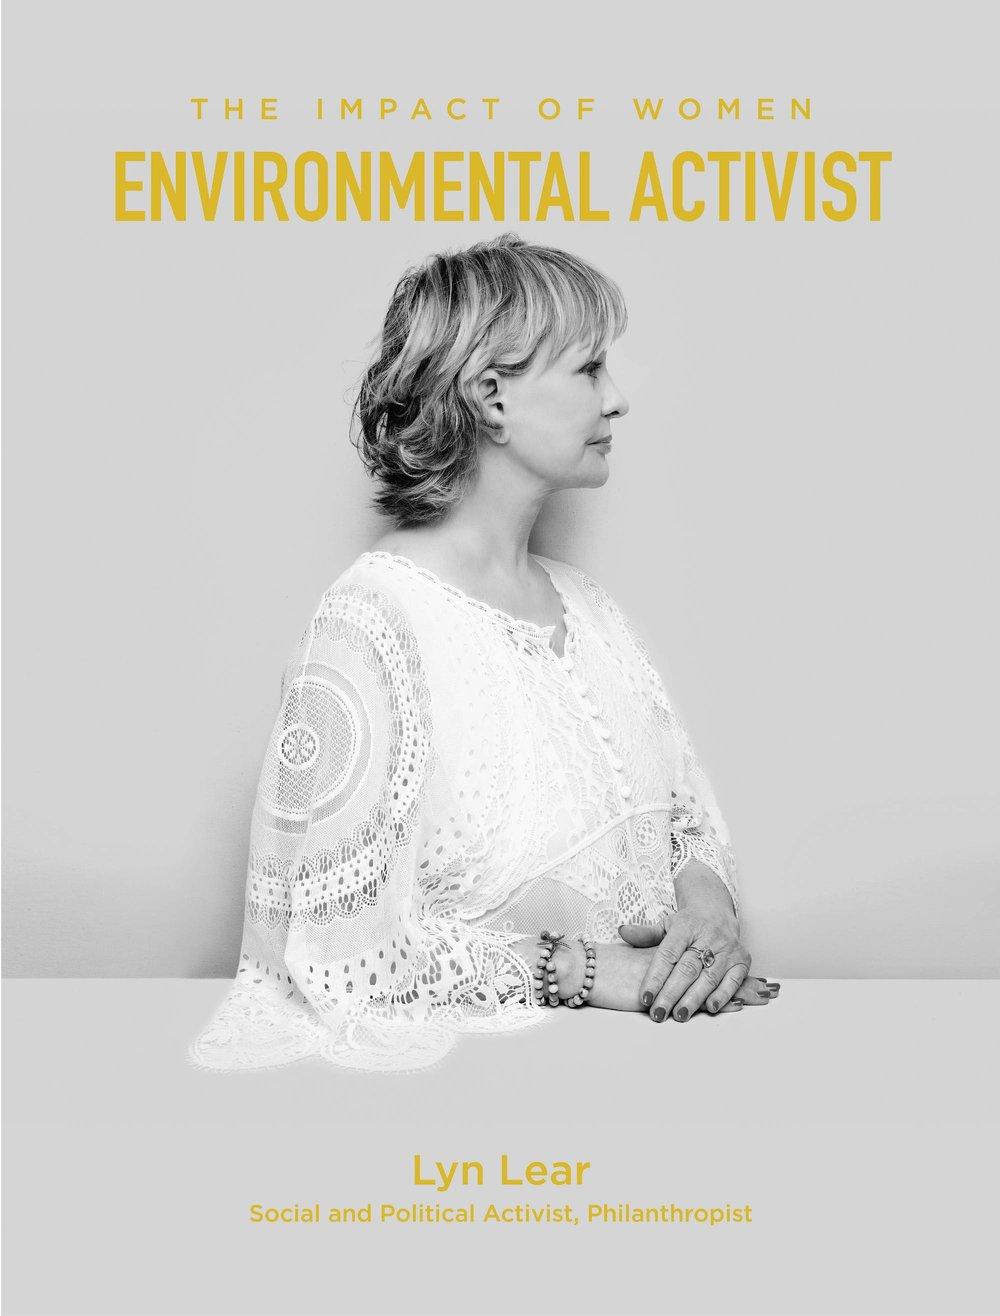 Lyn Lear is an Environmental Activist